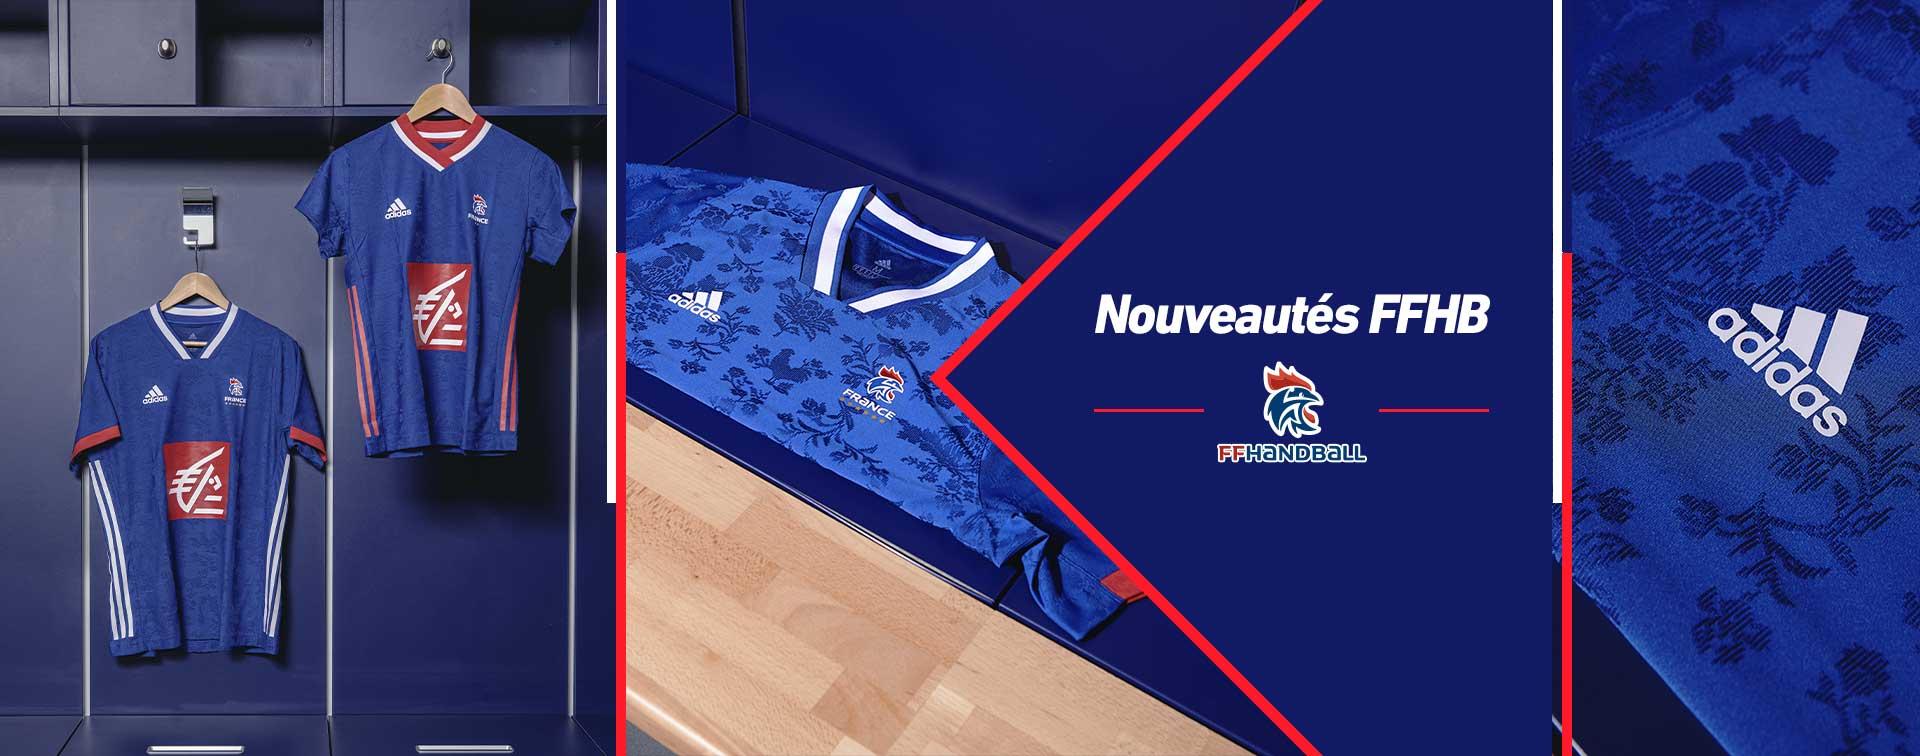 Nouveaux maillots adidas FFHB France handball